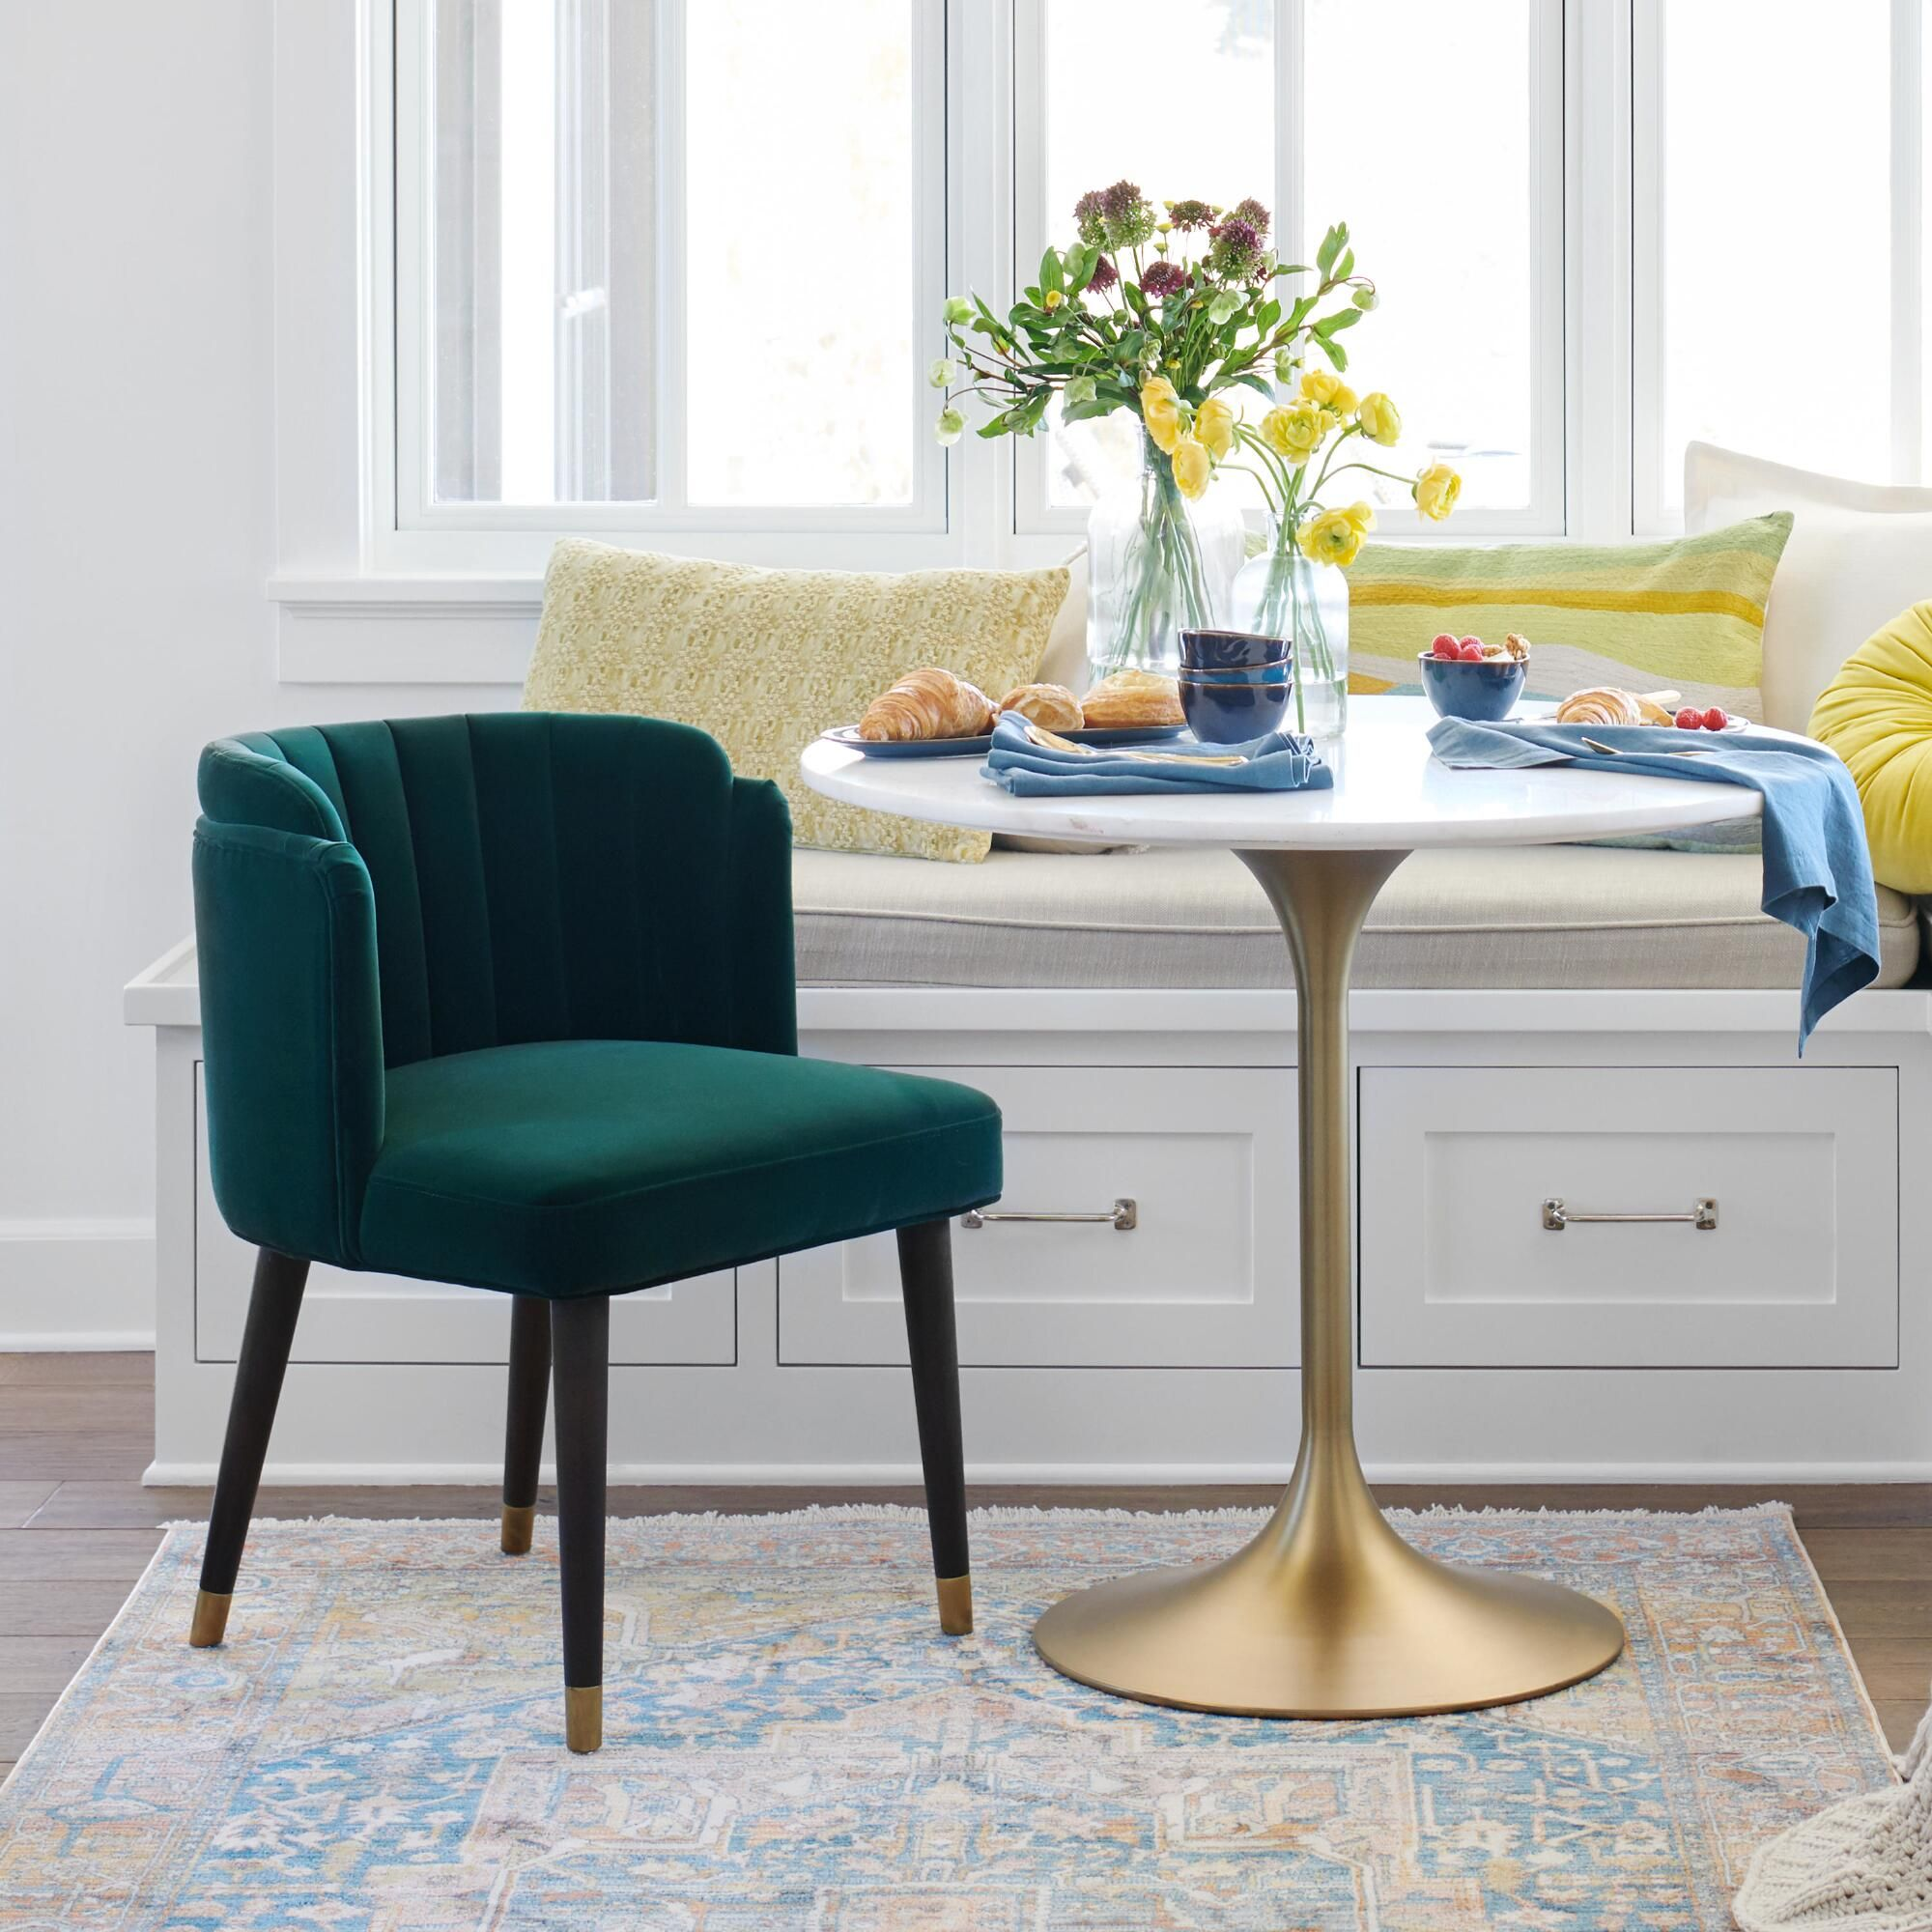 Green velvet channel back isadora dining chair set of 2 in